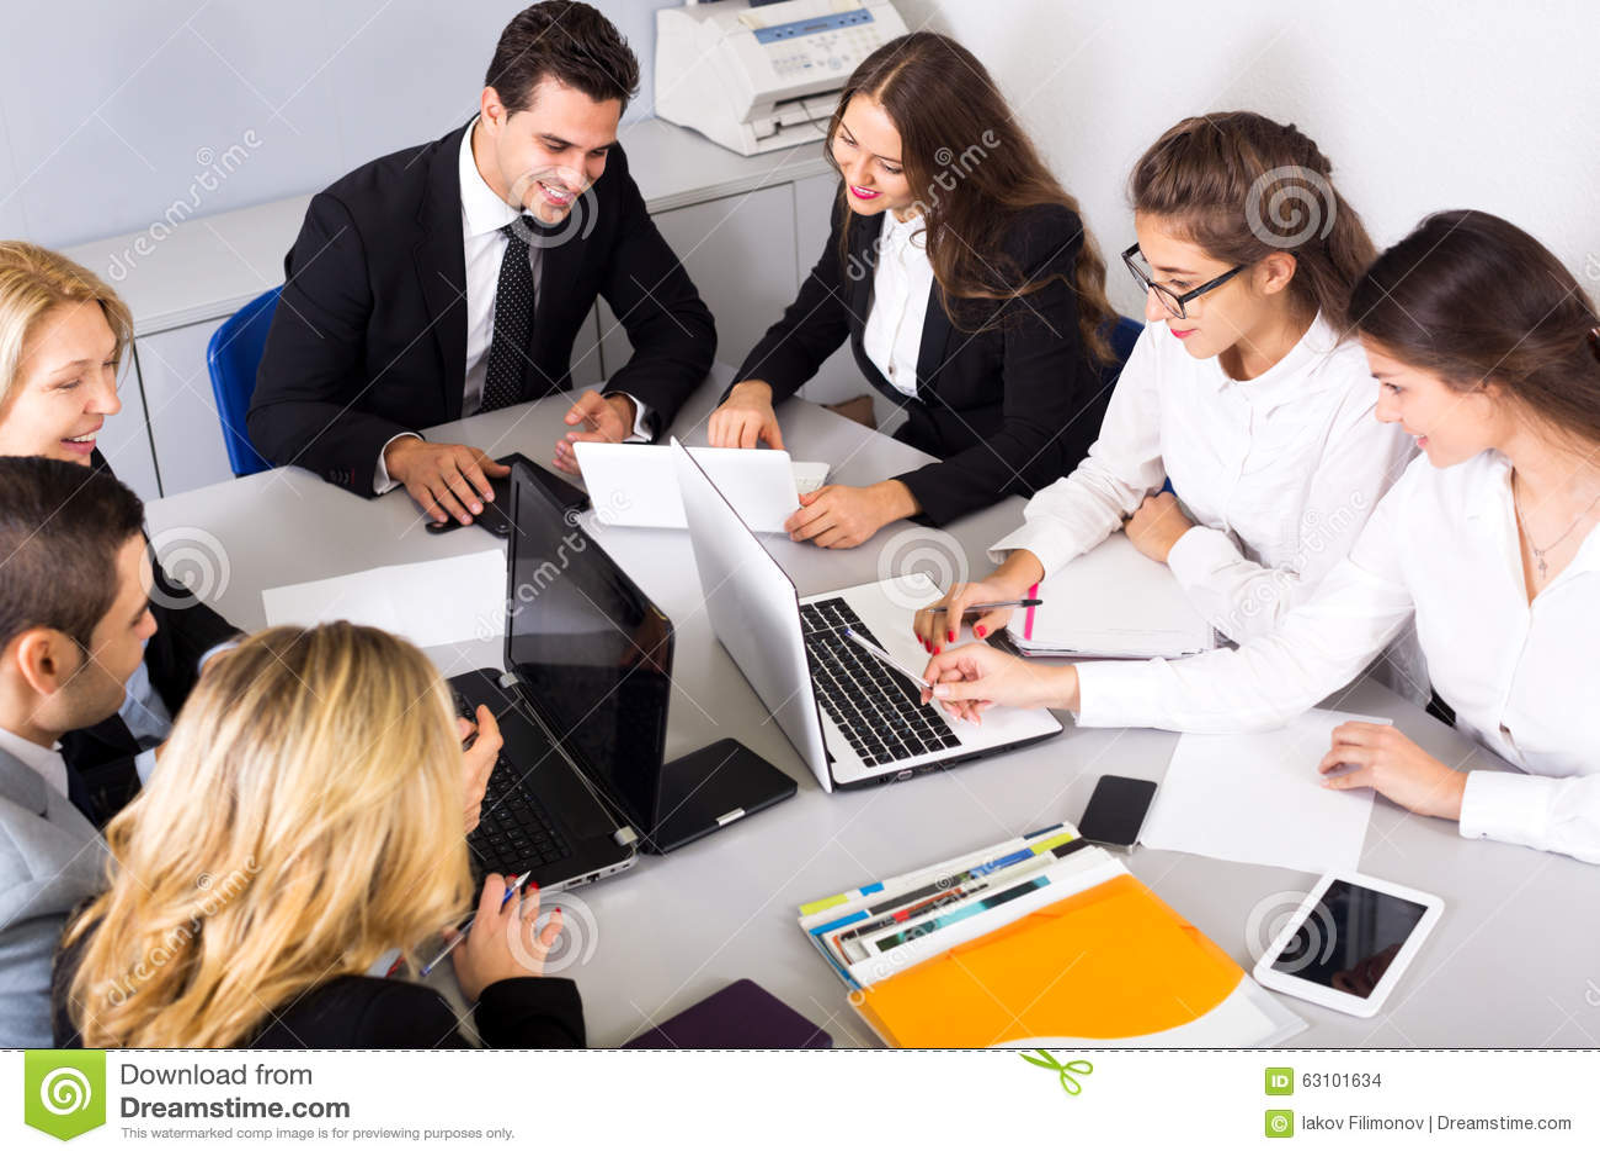 Business Meeting Of Multinational Managing Team Stock